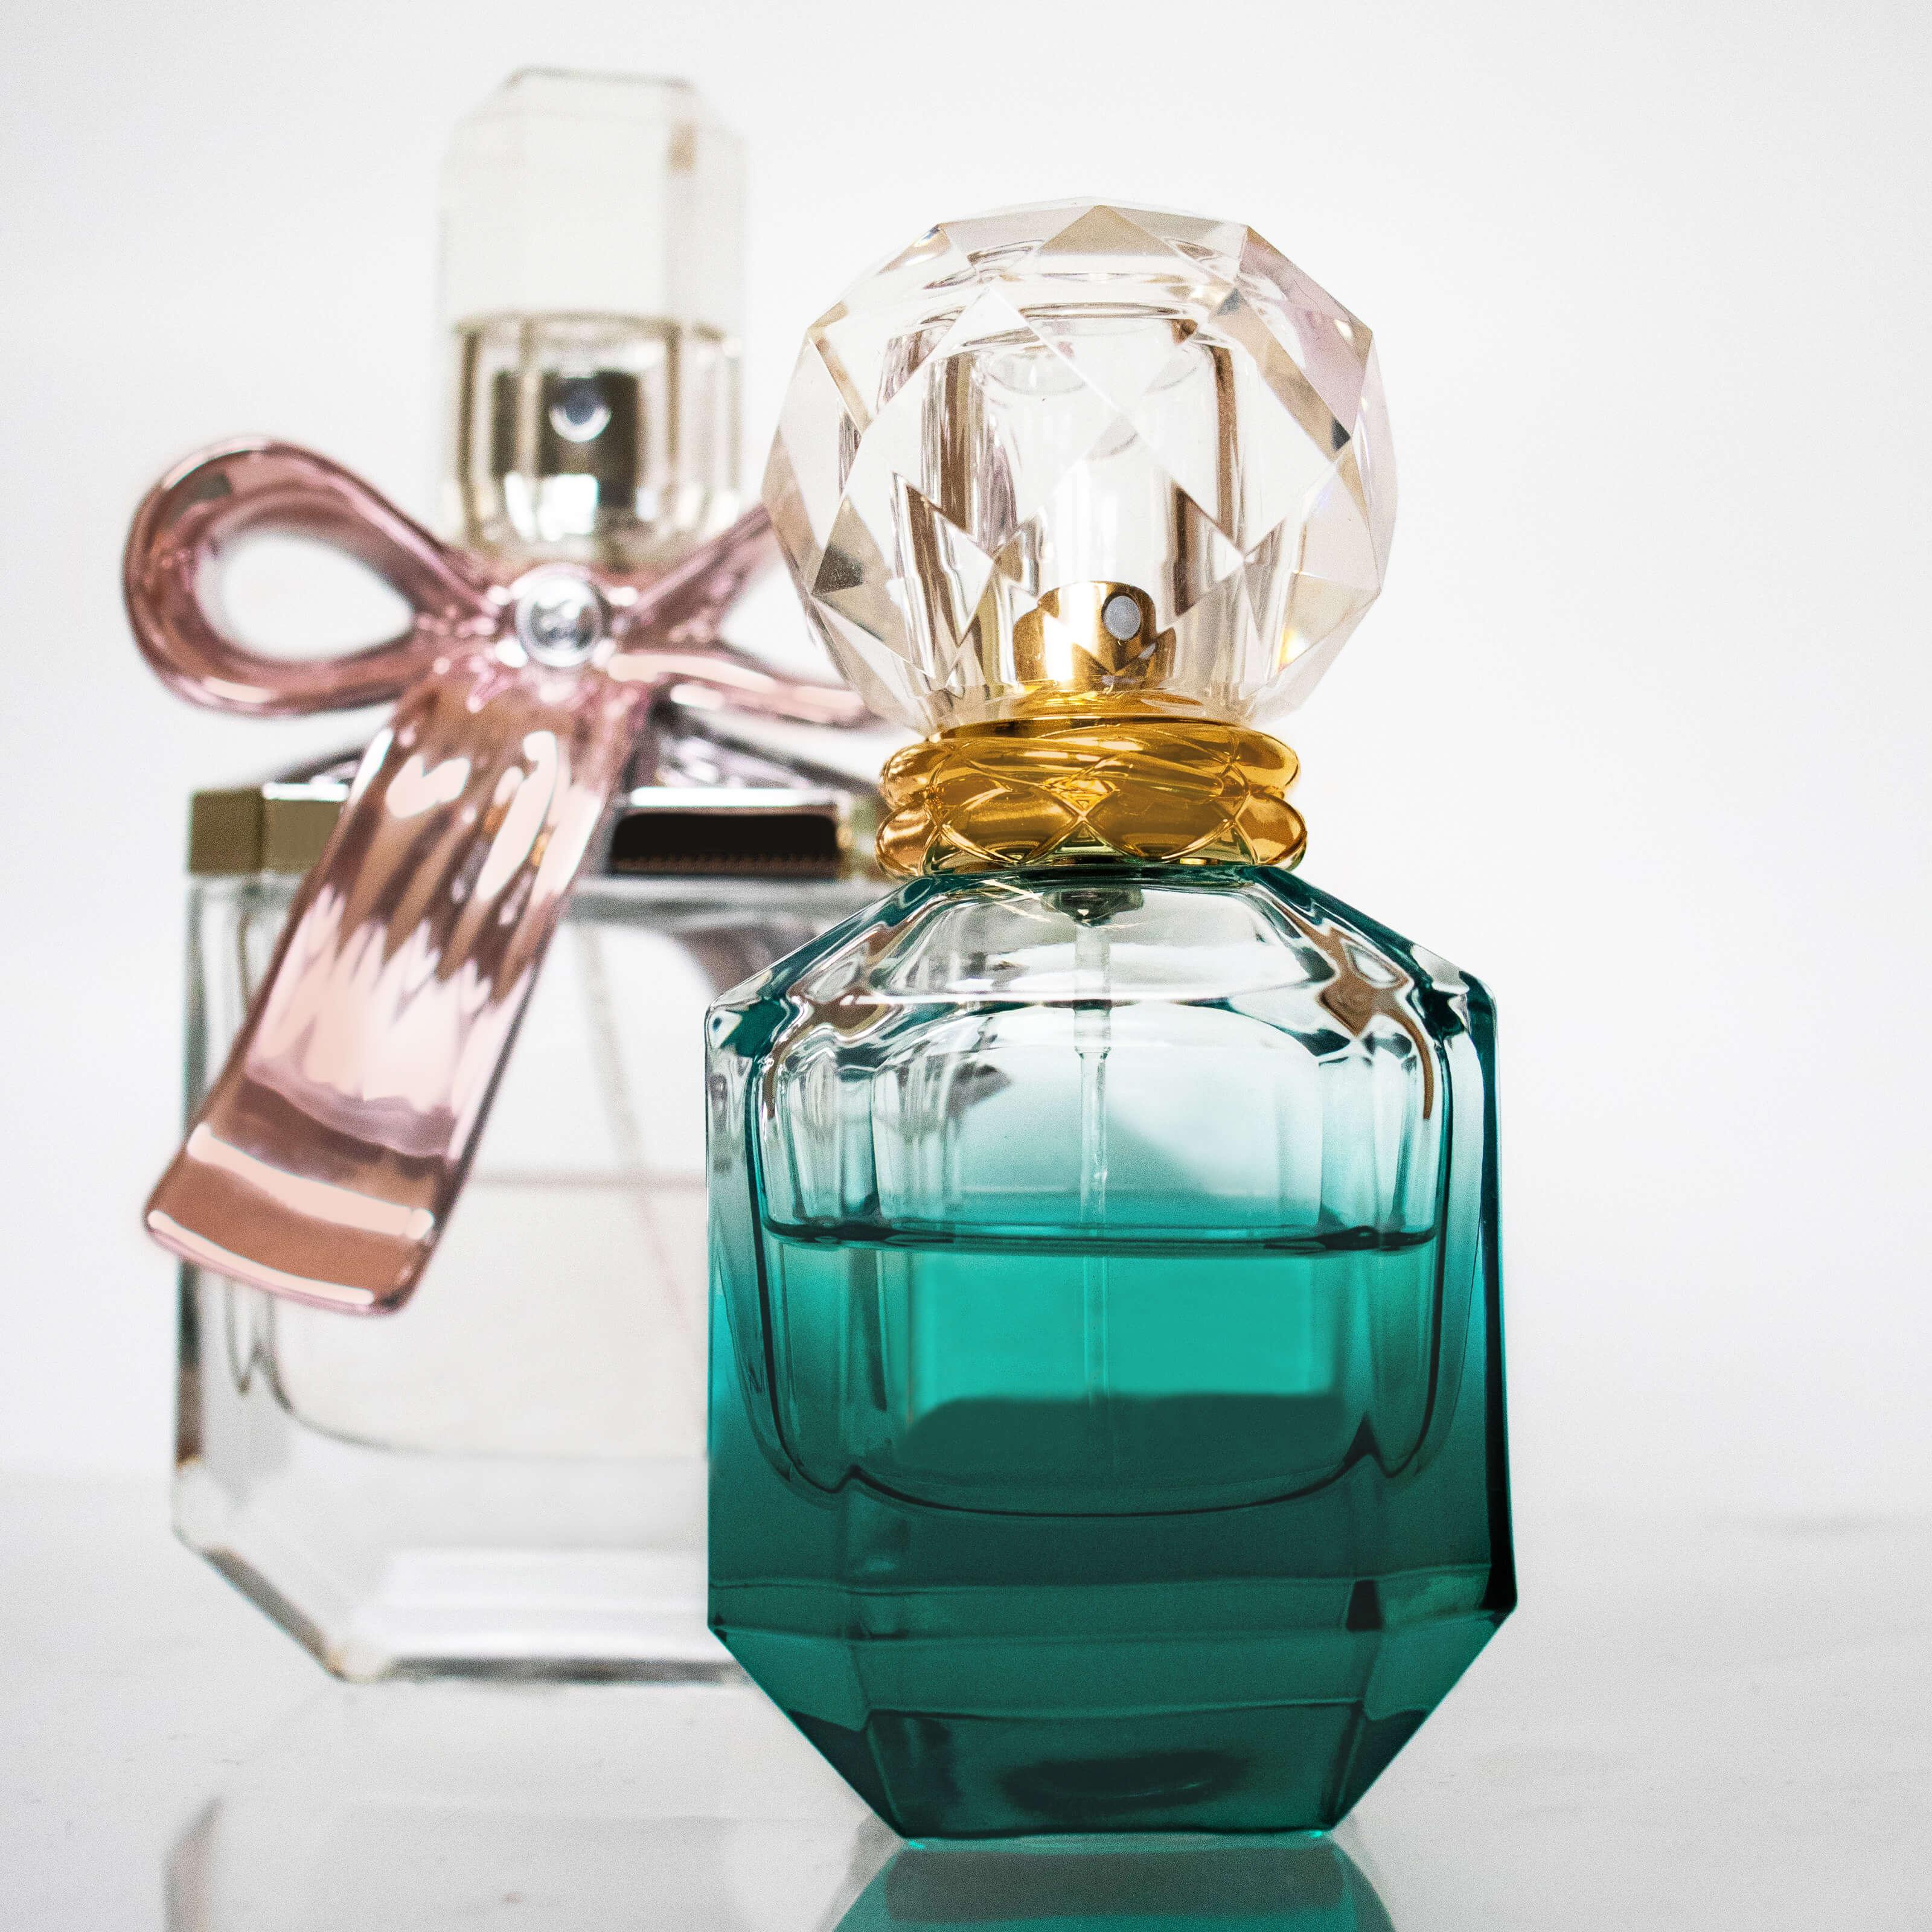 perfume bottles ribbons thumbnail image